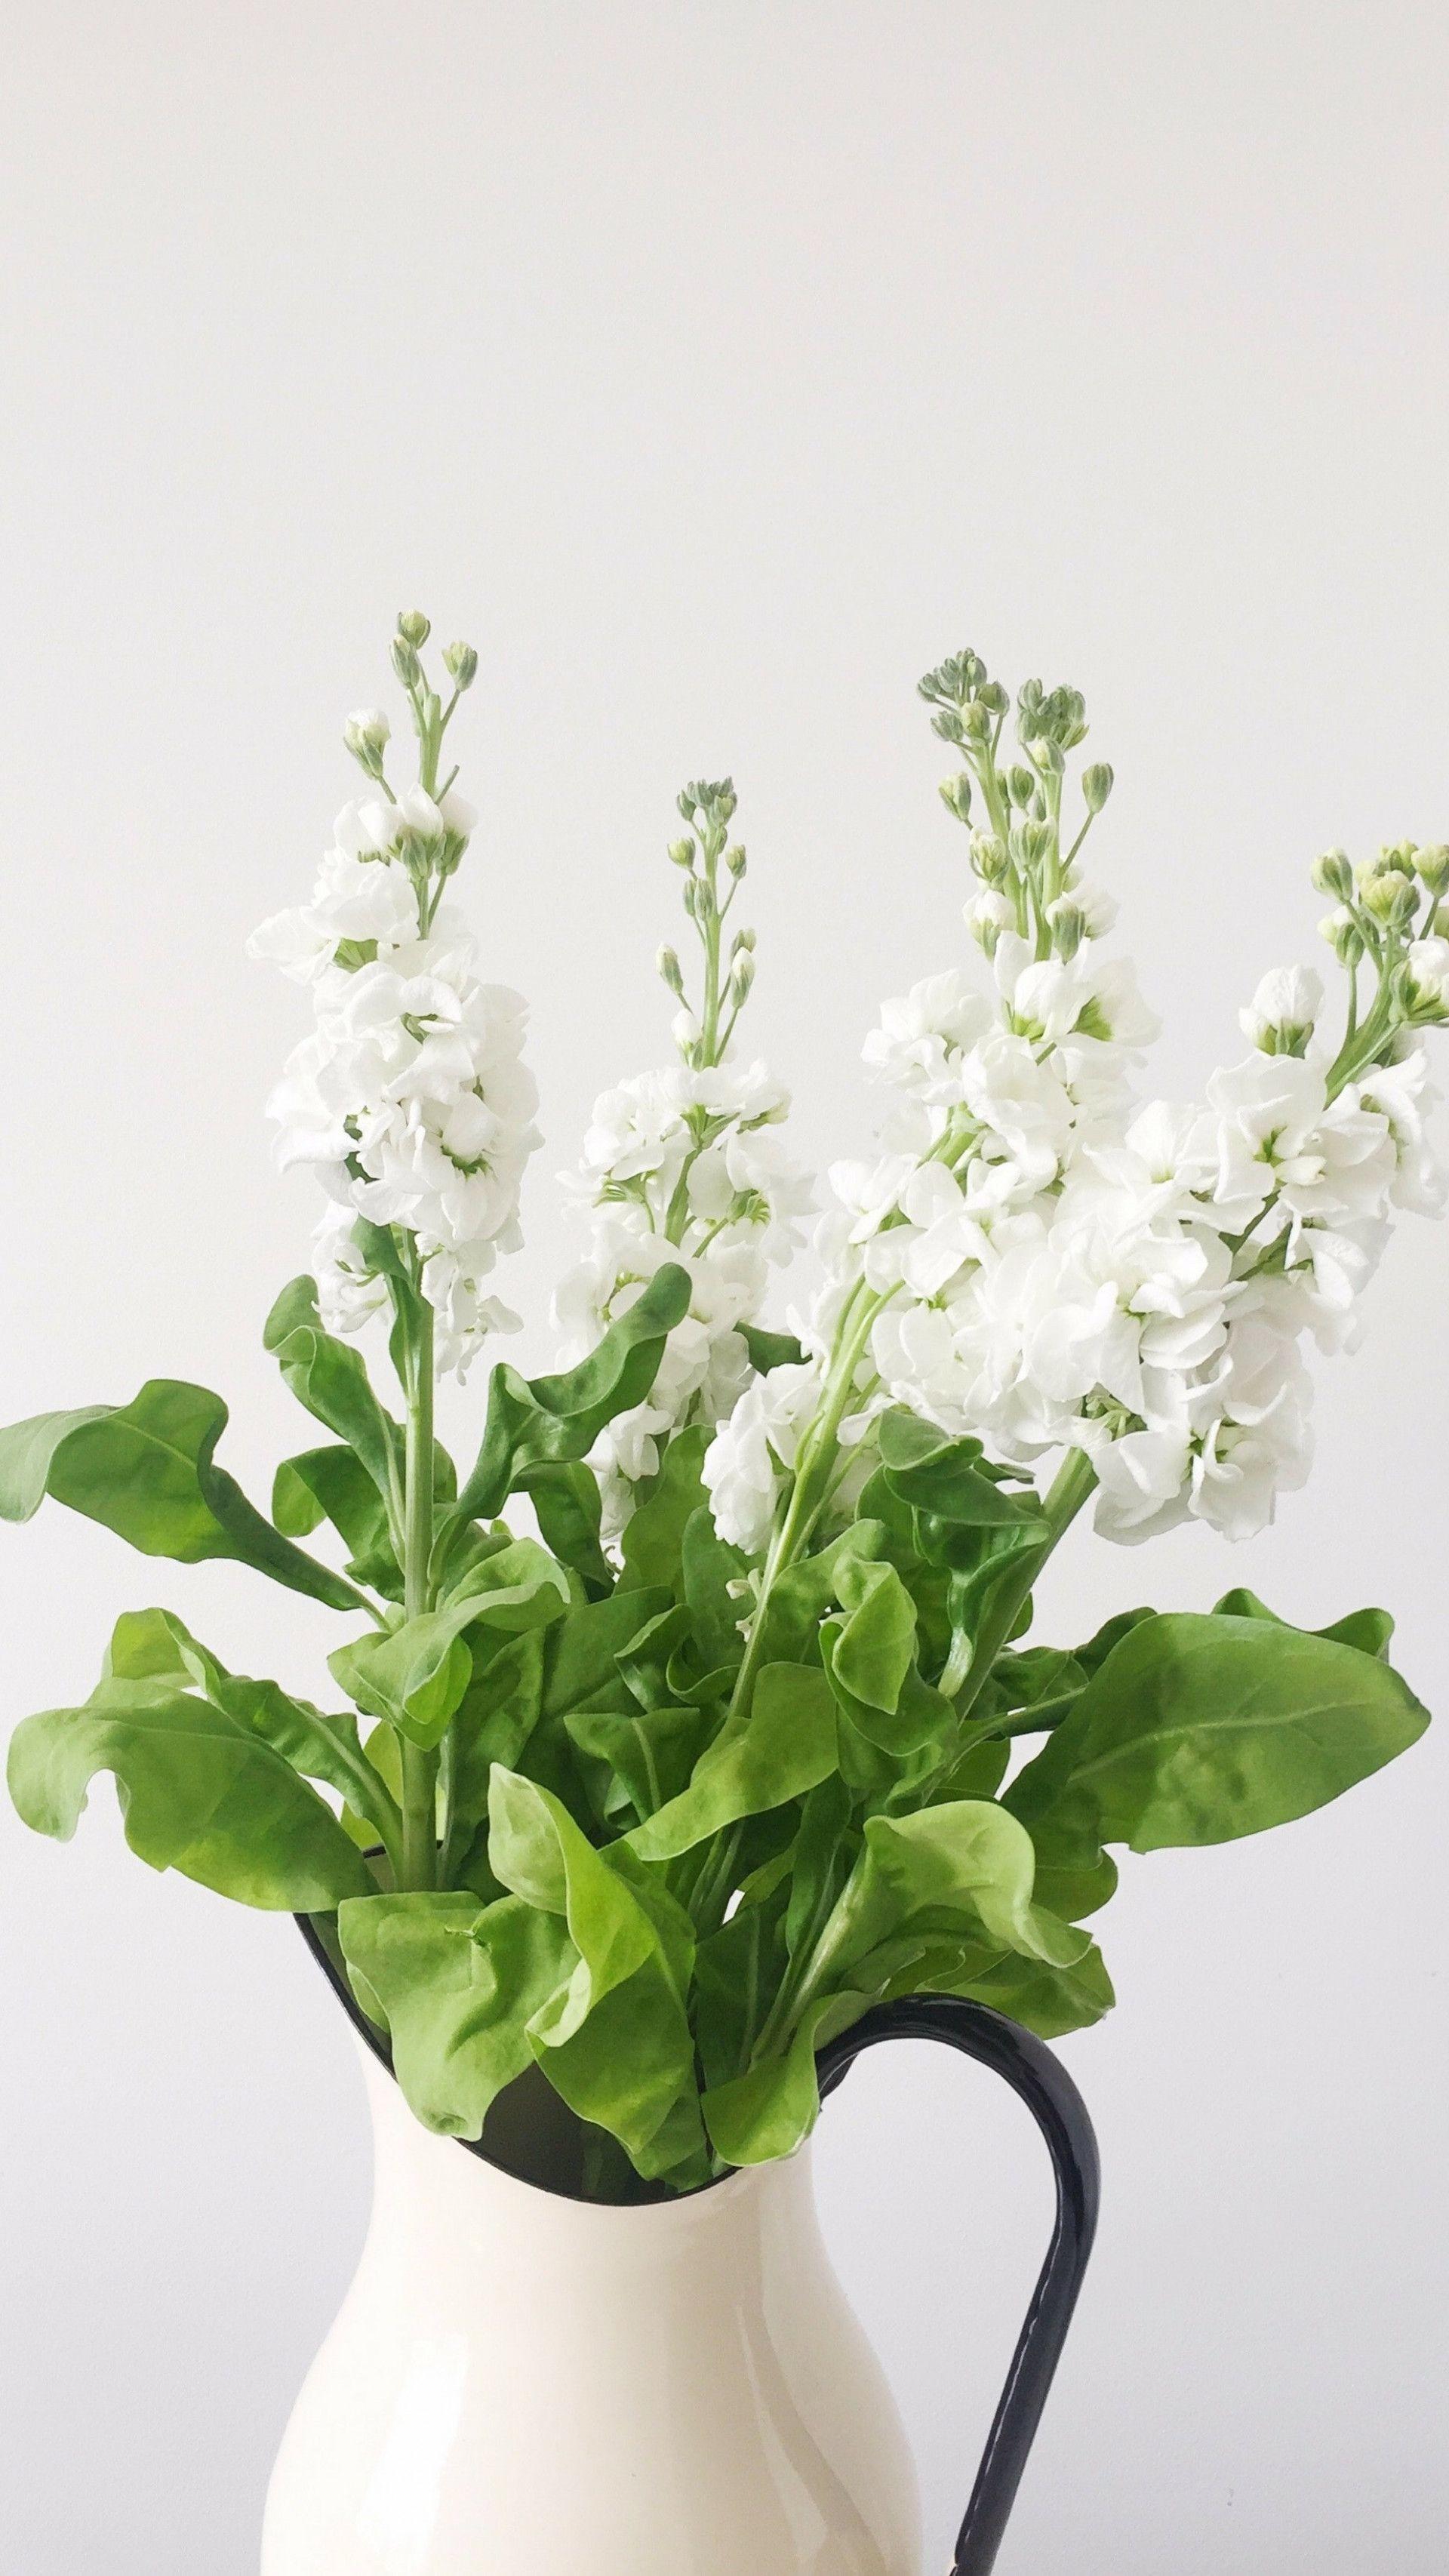 Res: 1920x3413, Flower Wallpaper 279